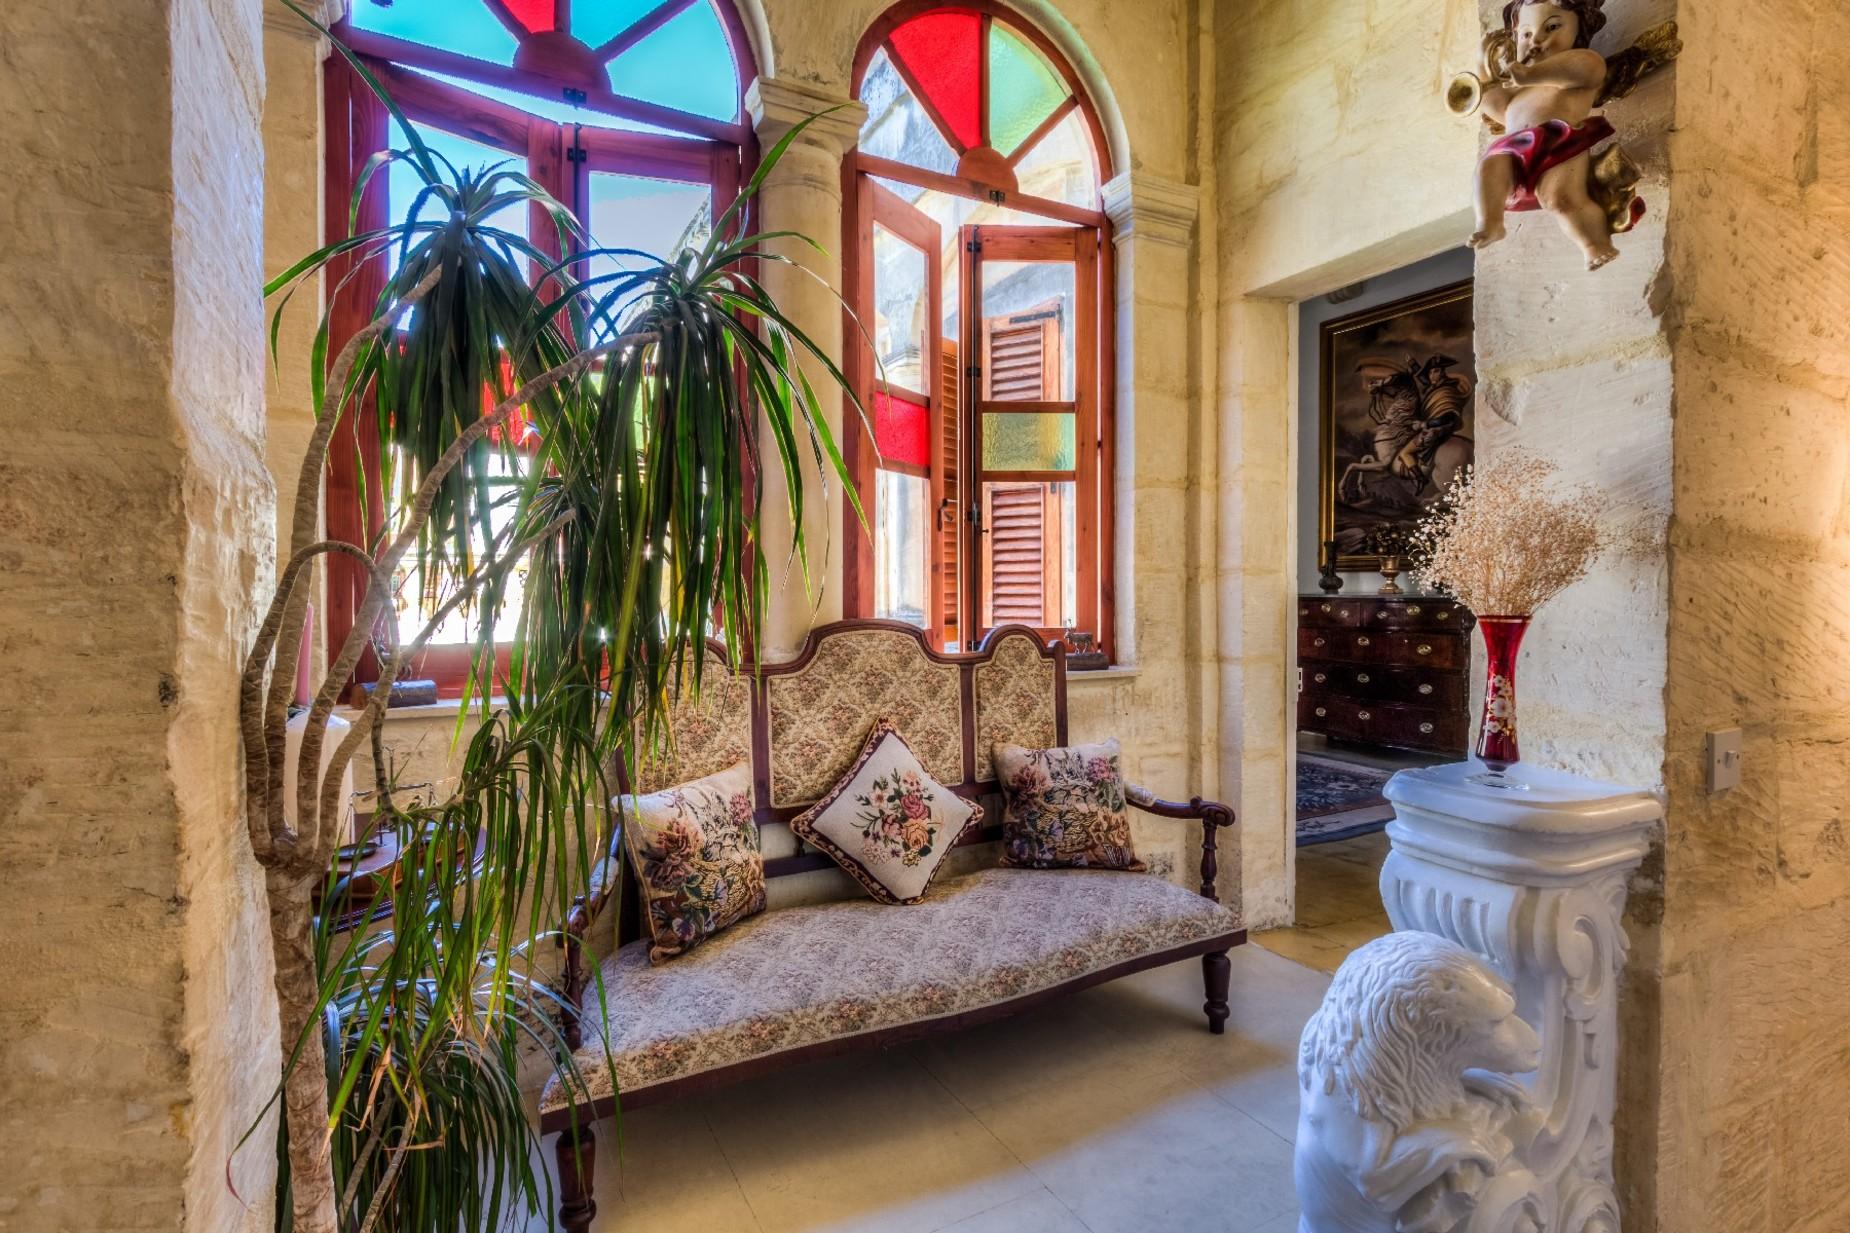 4 bed Town House For Sale in Birkirkara, Birkirkara - thumb 6